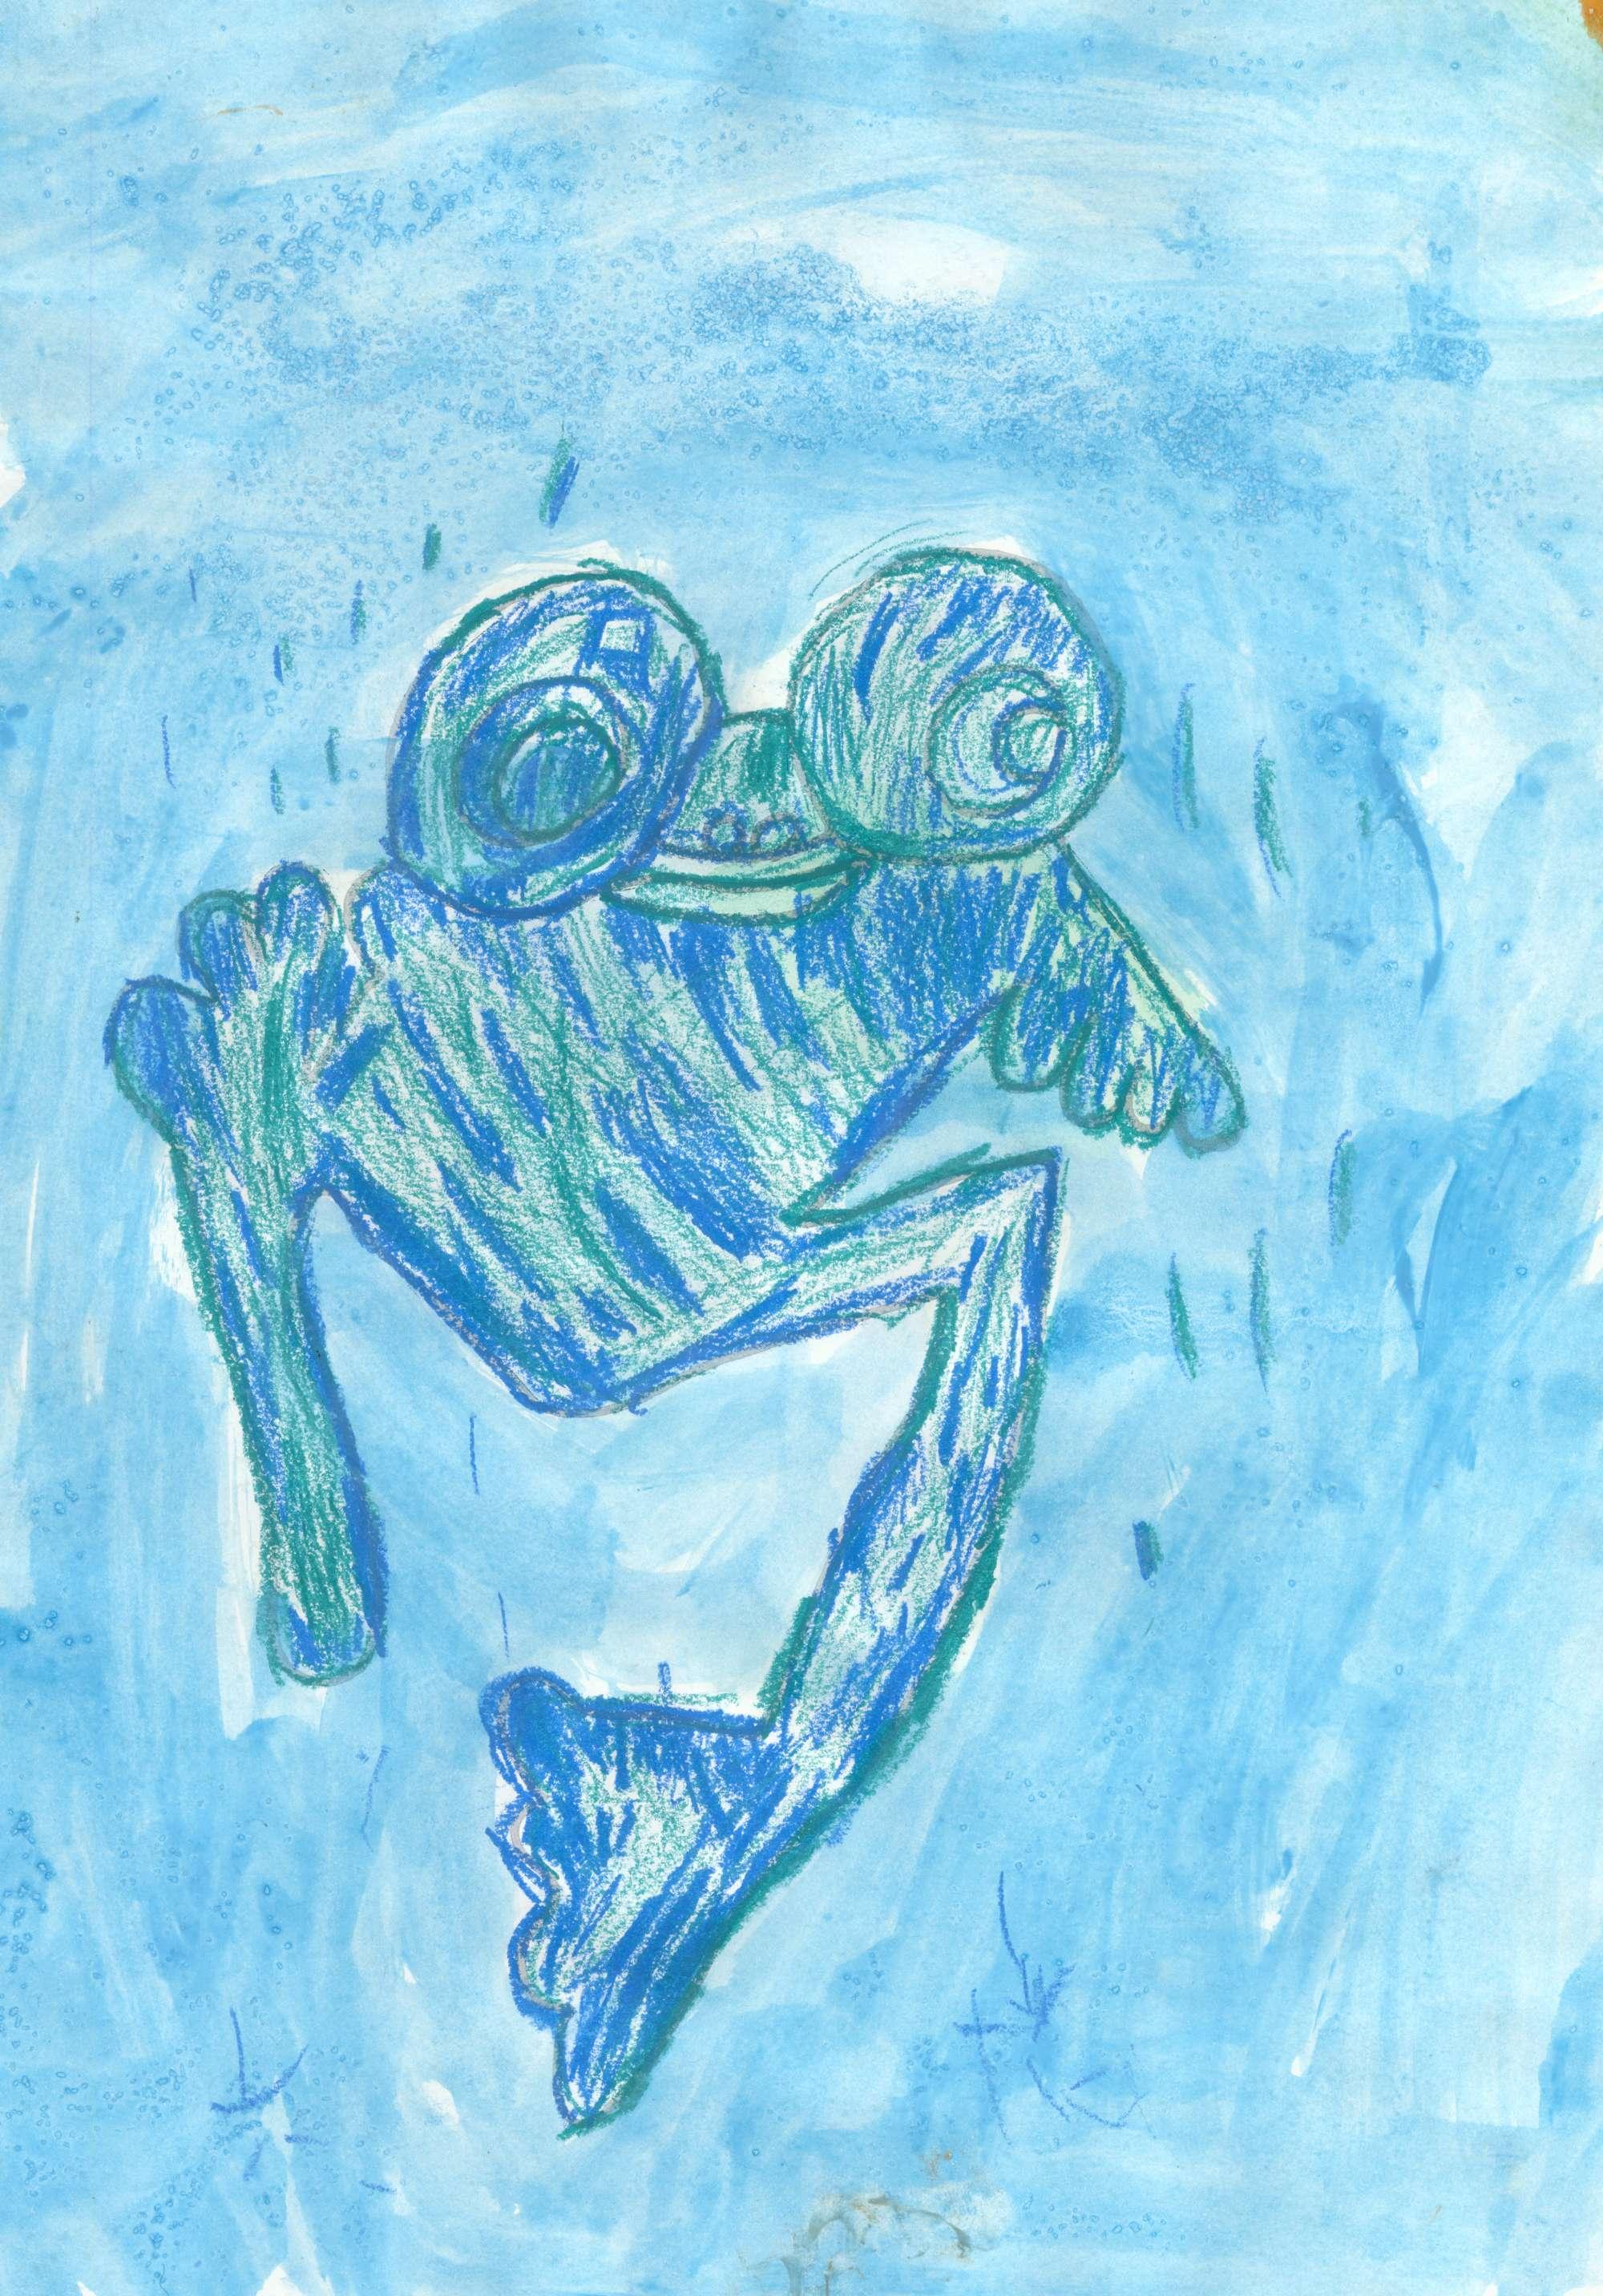 Frog waiting